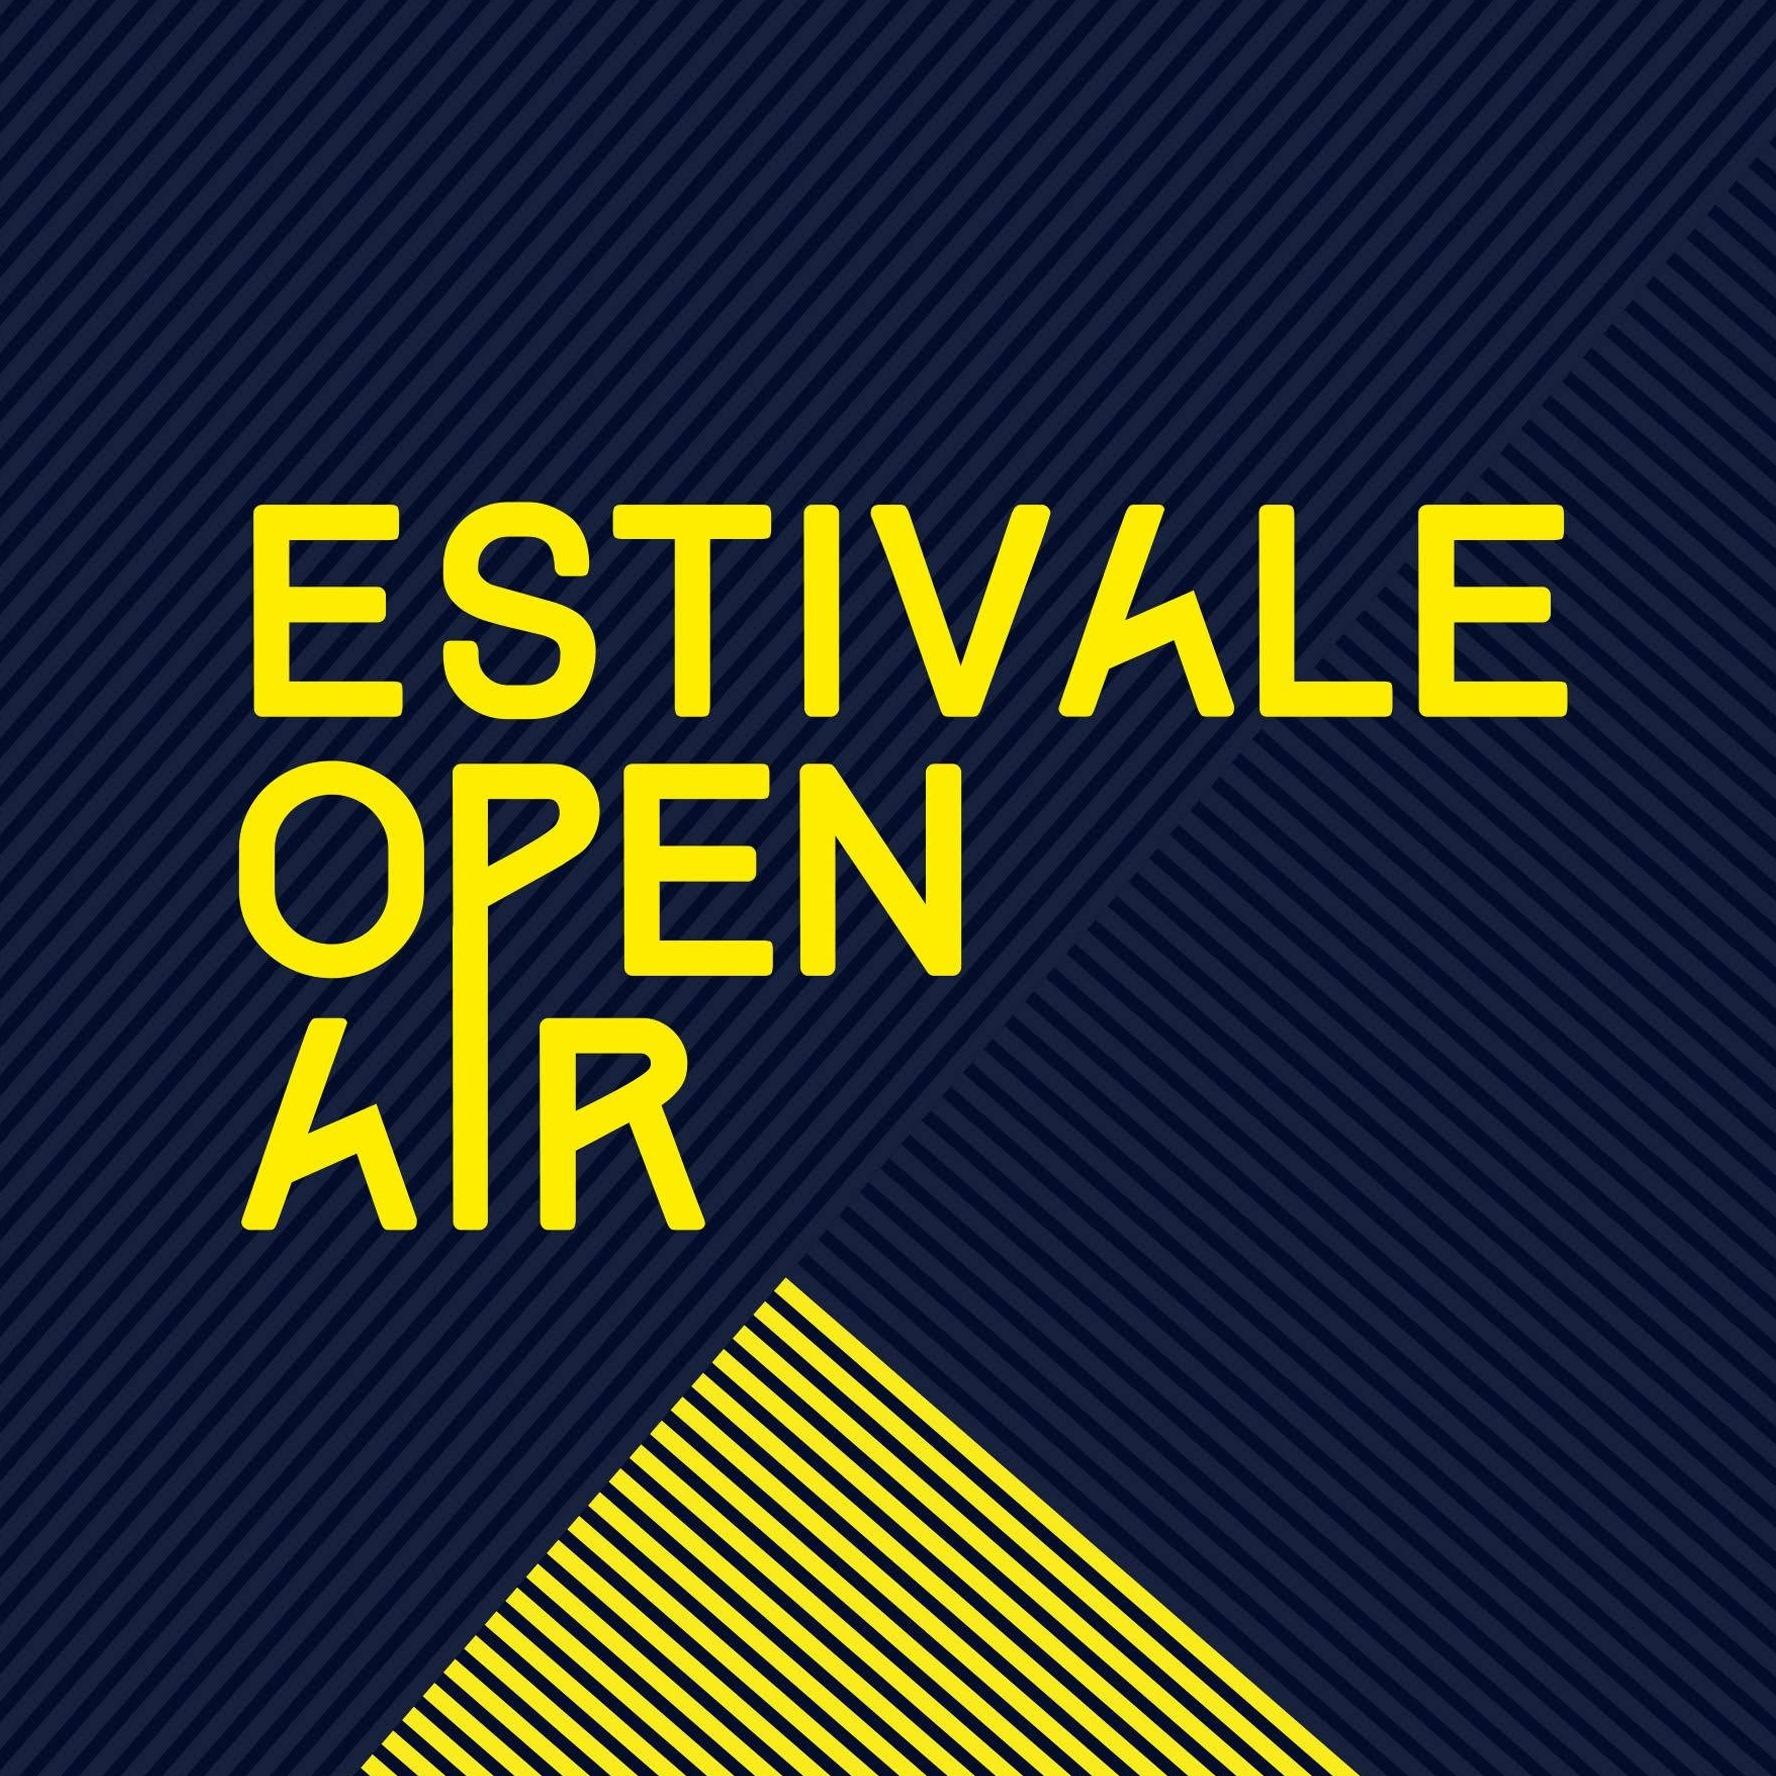 Lefa @ Estivale Open Air